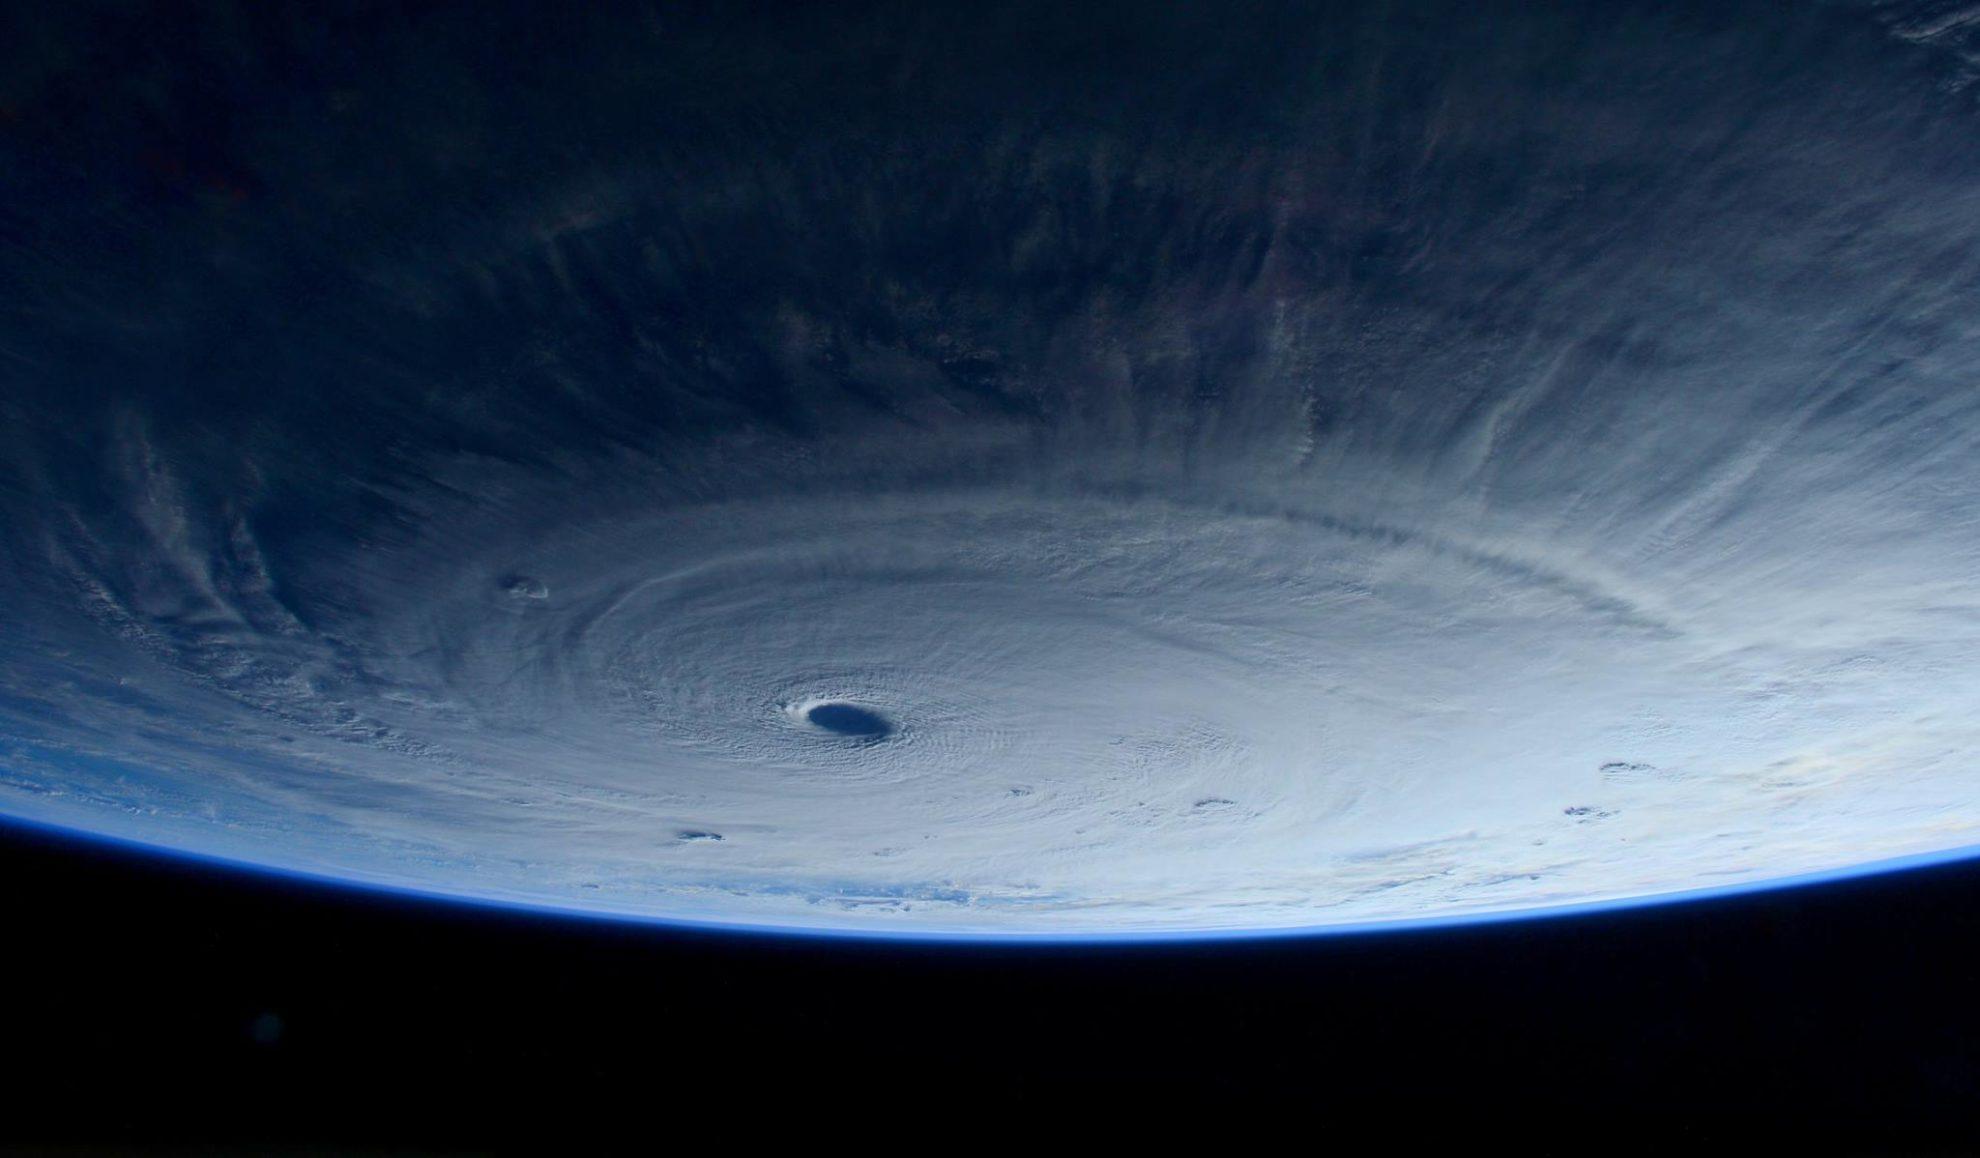 Тайфун  Майсак с борта МКС. Фотография Samantha Cristoforetti.